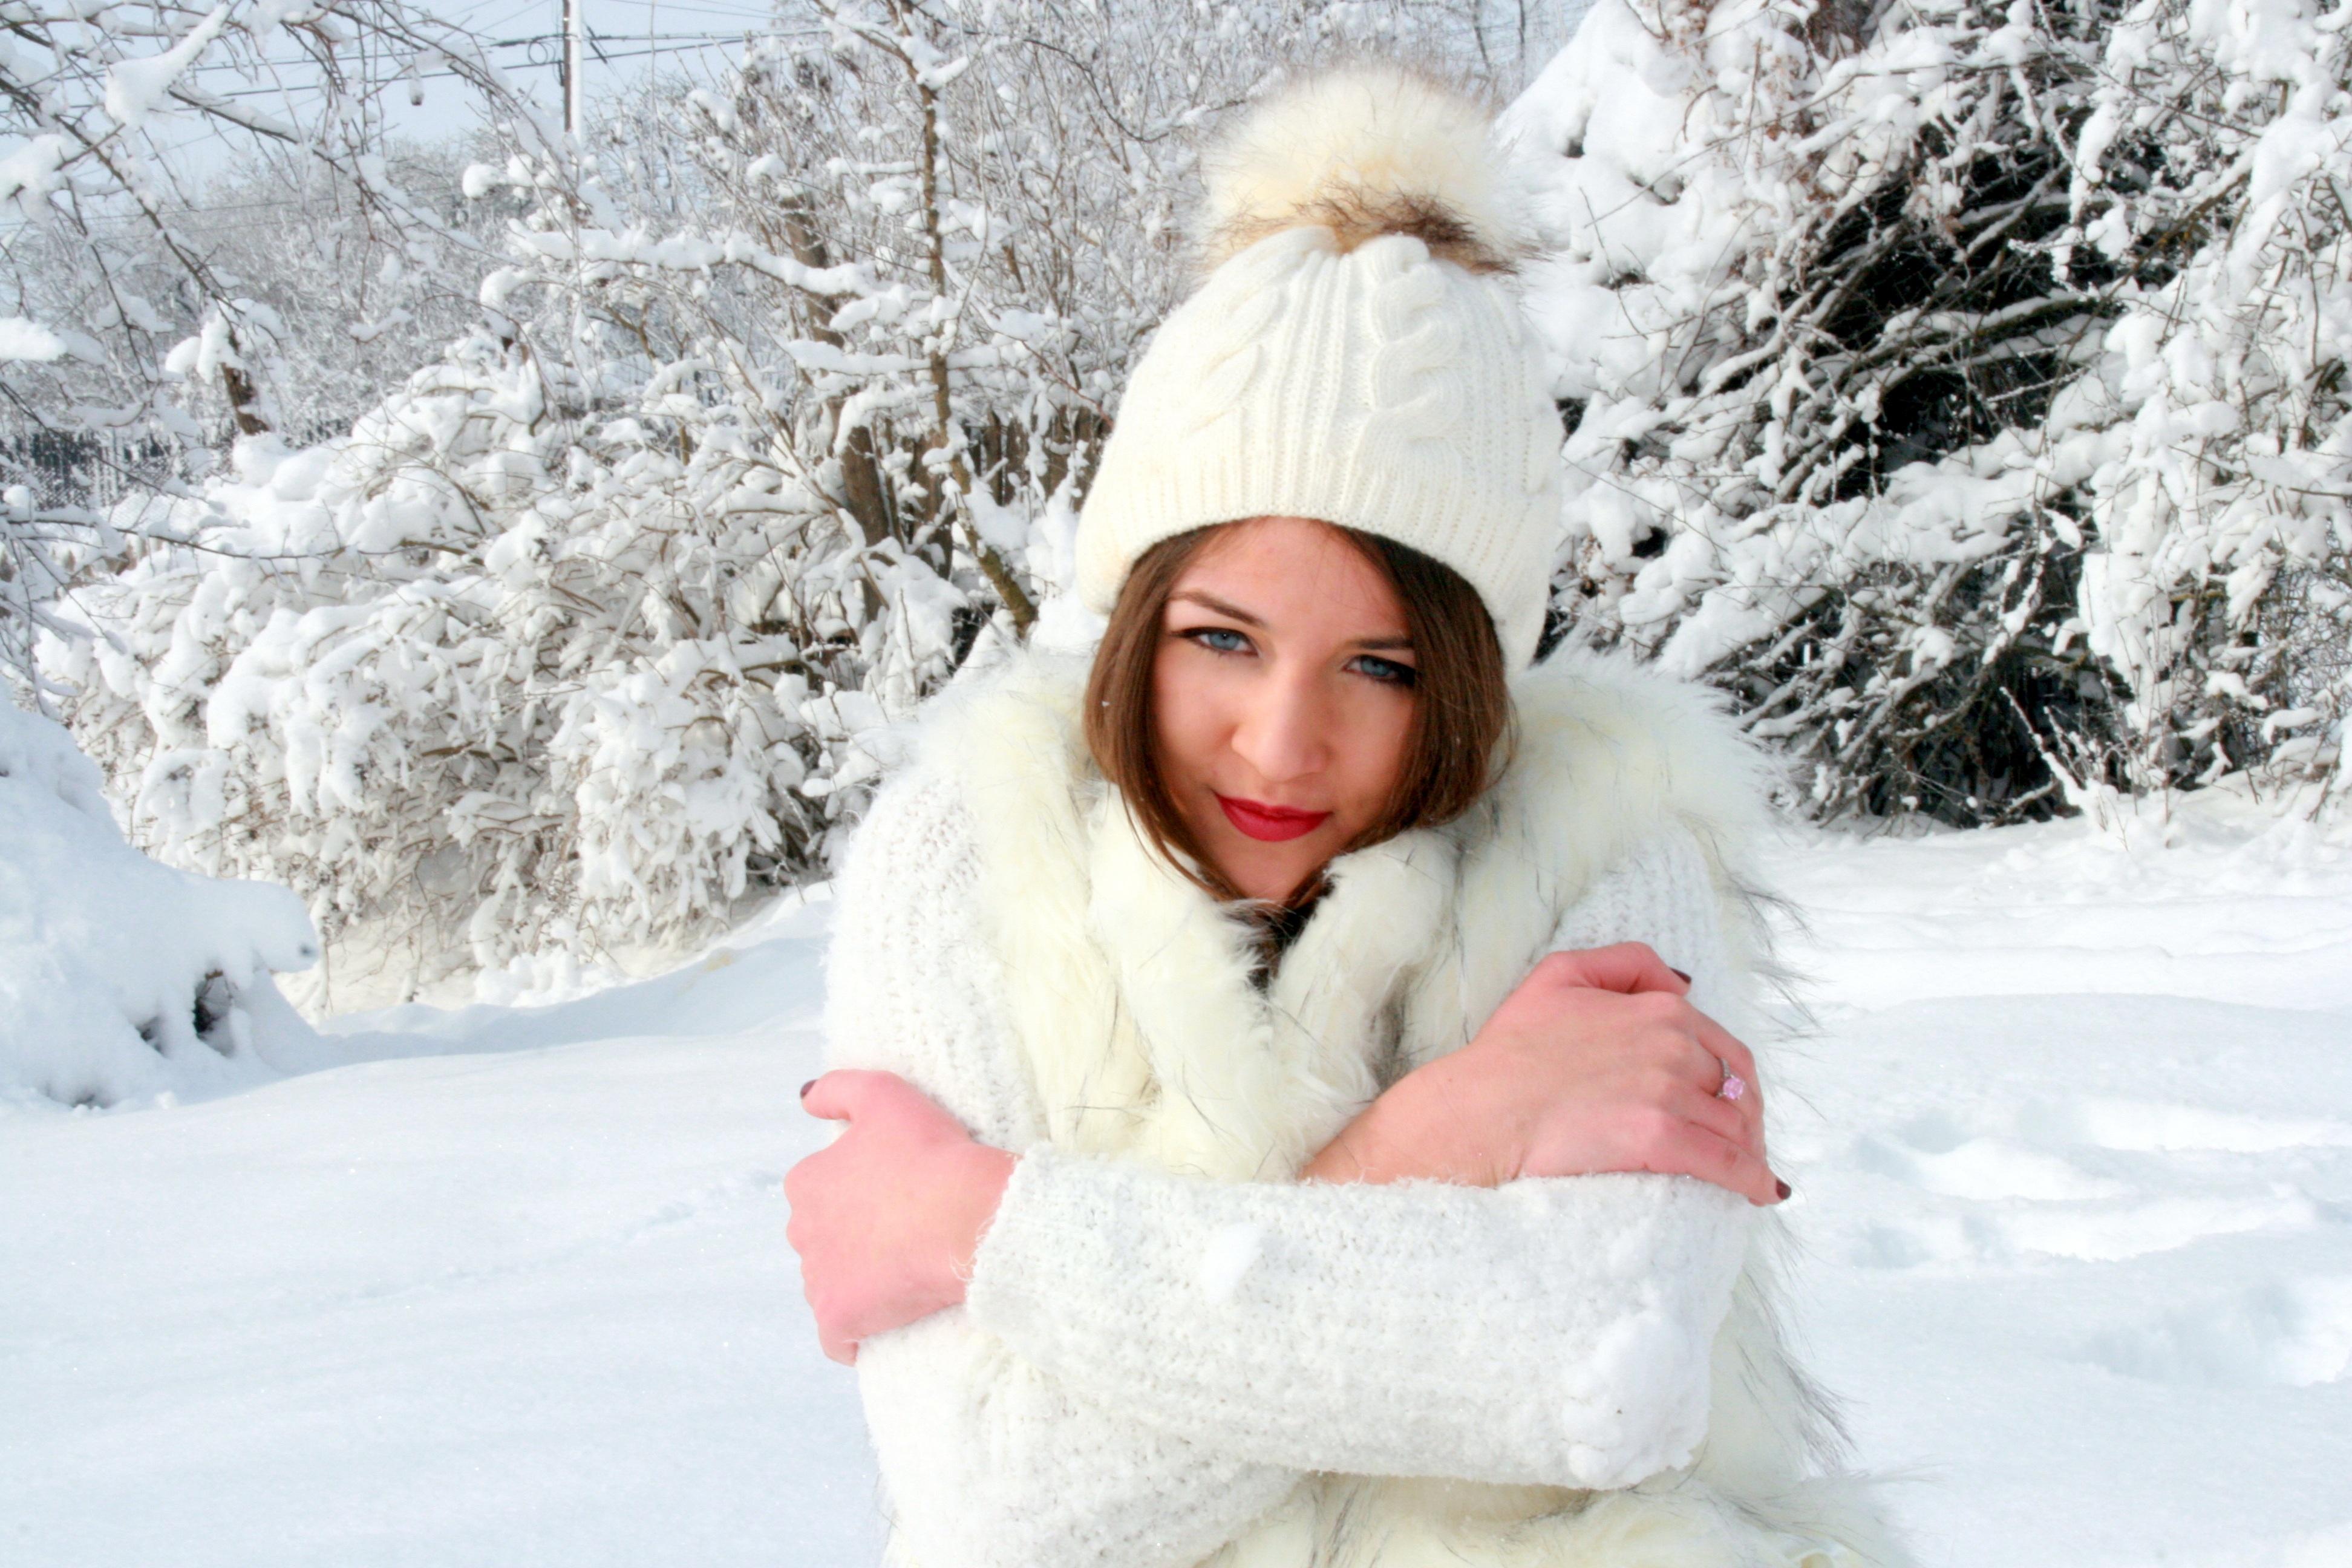 perepihnulis-zimoy-s-blondinkoy-ero-cherno-belie-foto